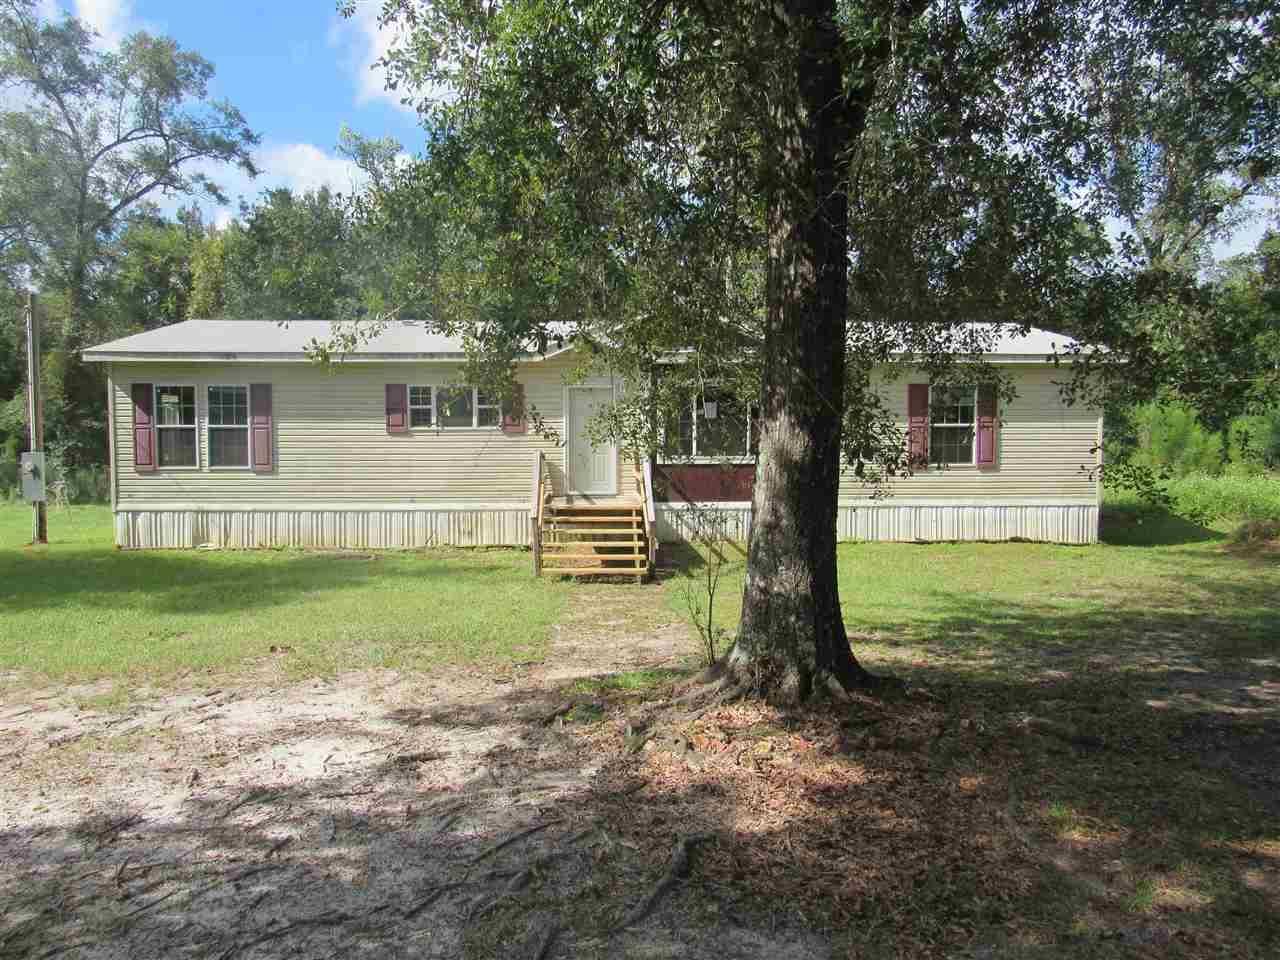 328 Armstead Road, Quincy, FL 32351 - MLS#: 323917